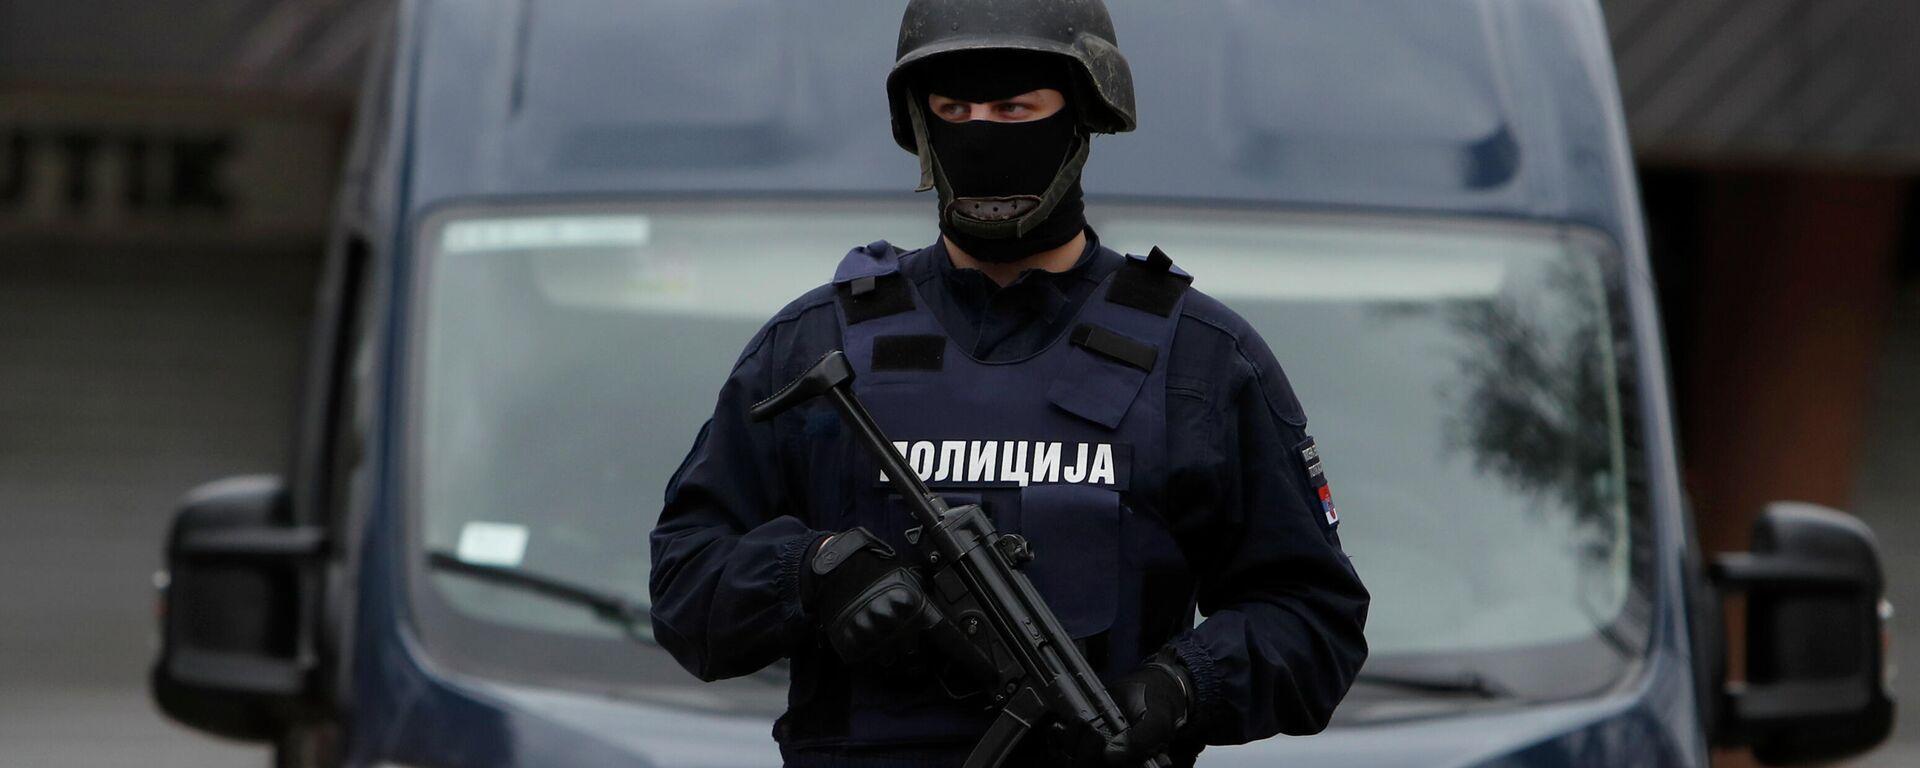 Polizei in Serbien - SNA, 1920, 27.09.2021